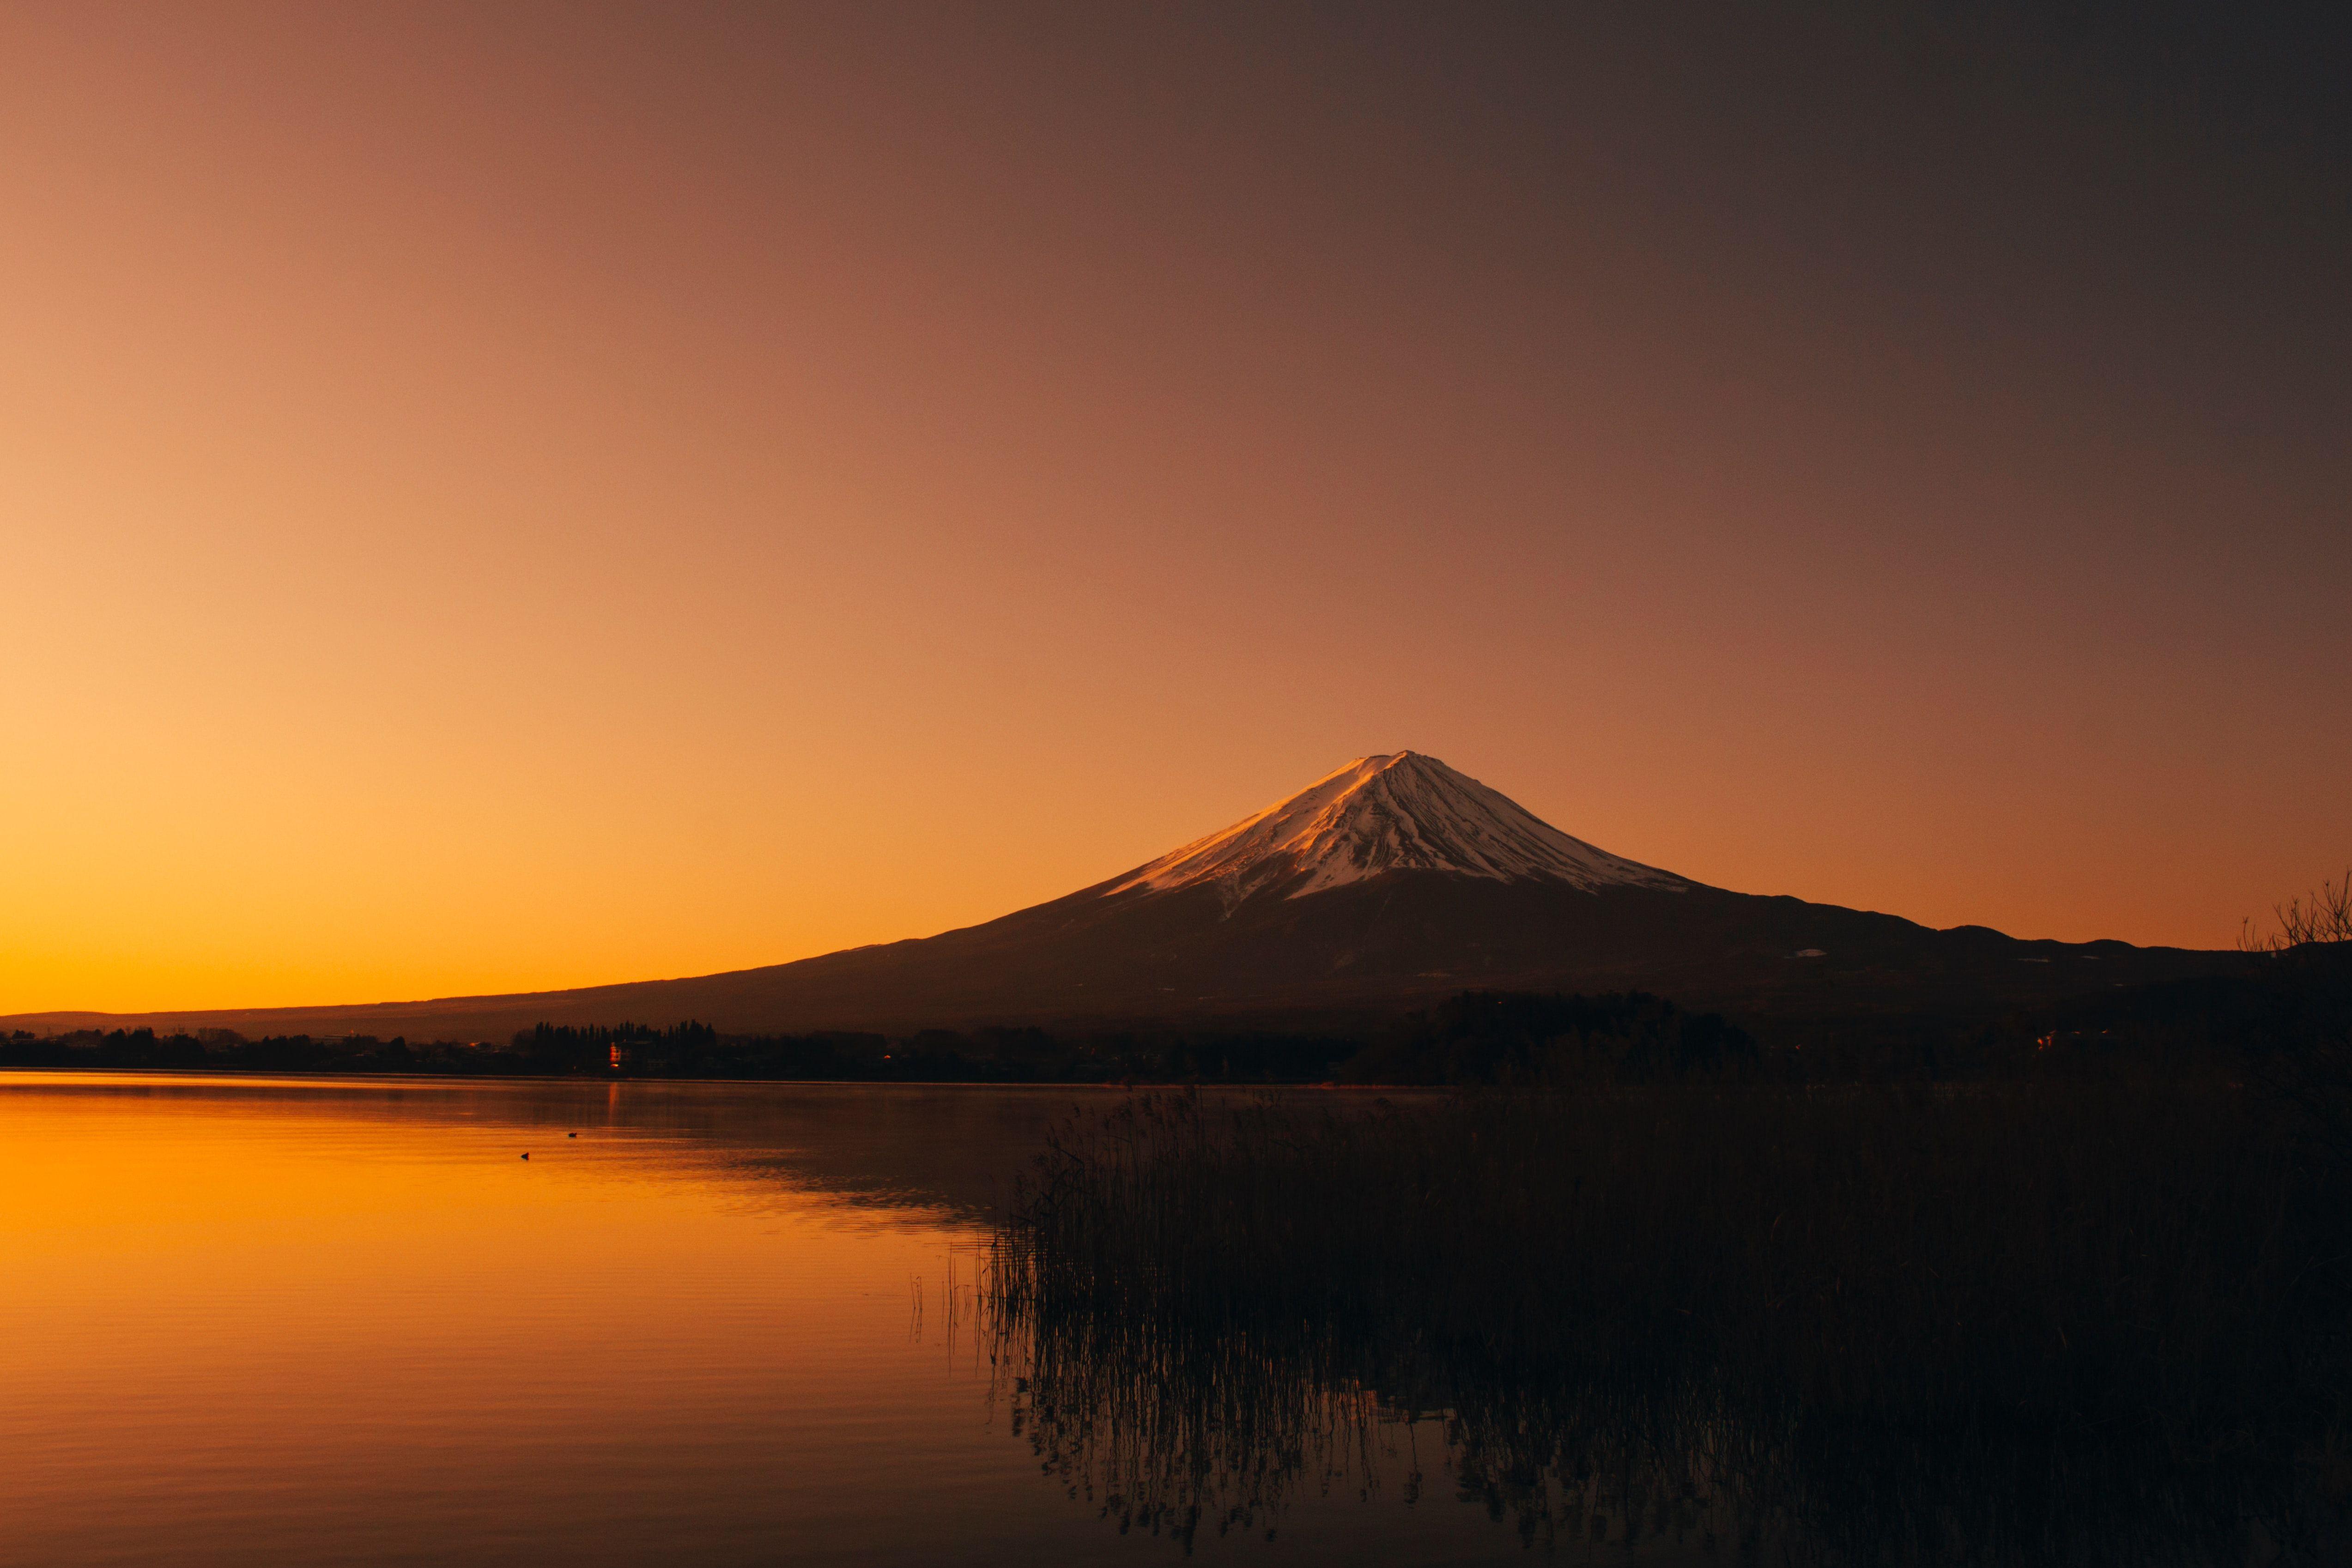 Mt Fuji 4k Wallpaper Sunset Images Sunset Wallpaper Fuji